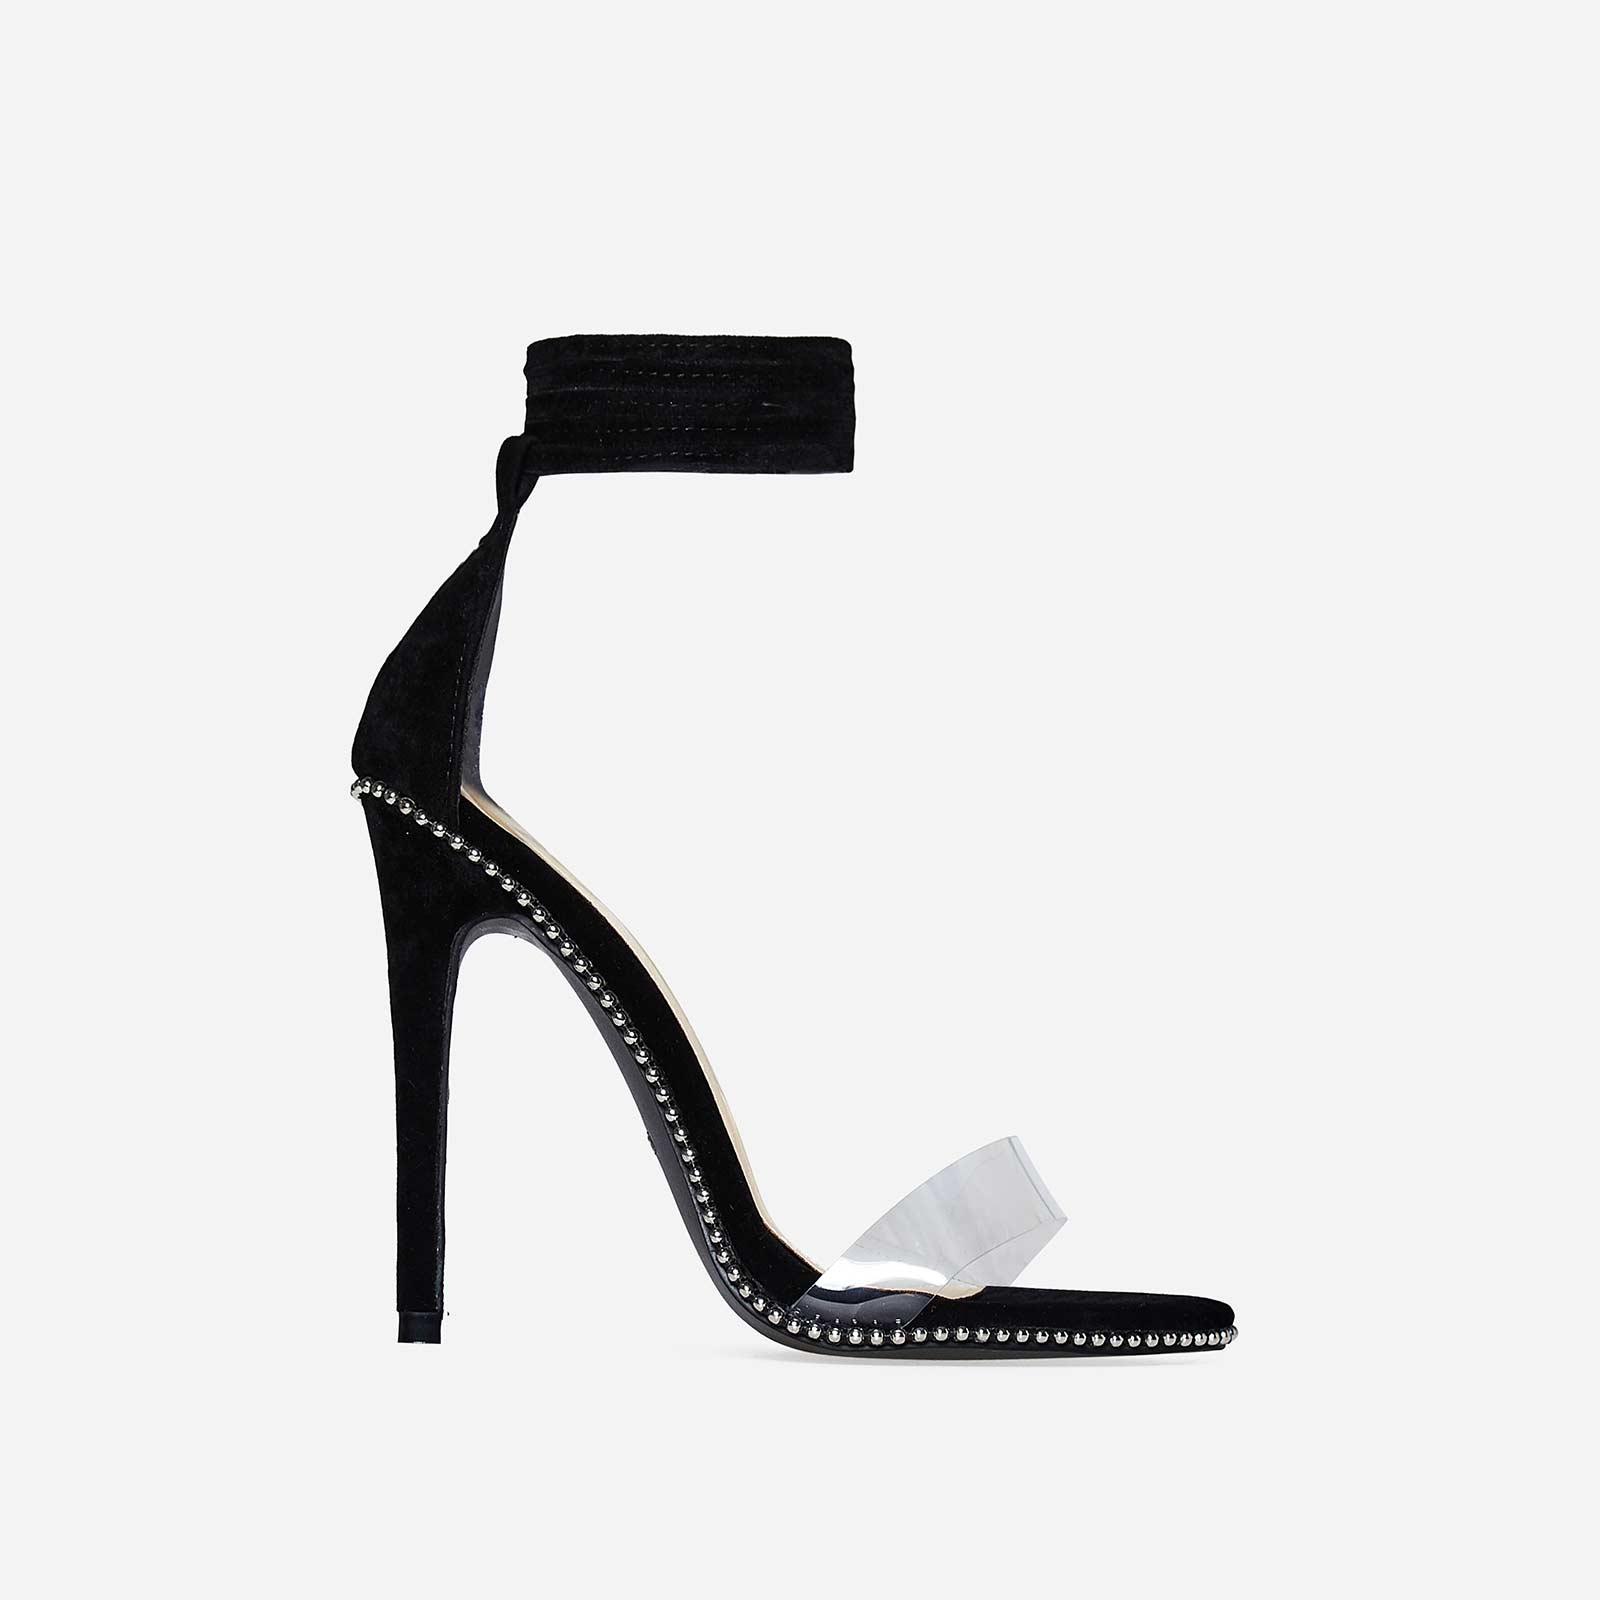 Elodie Studded Lace Up Perspex Heel In Black Faux Suede